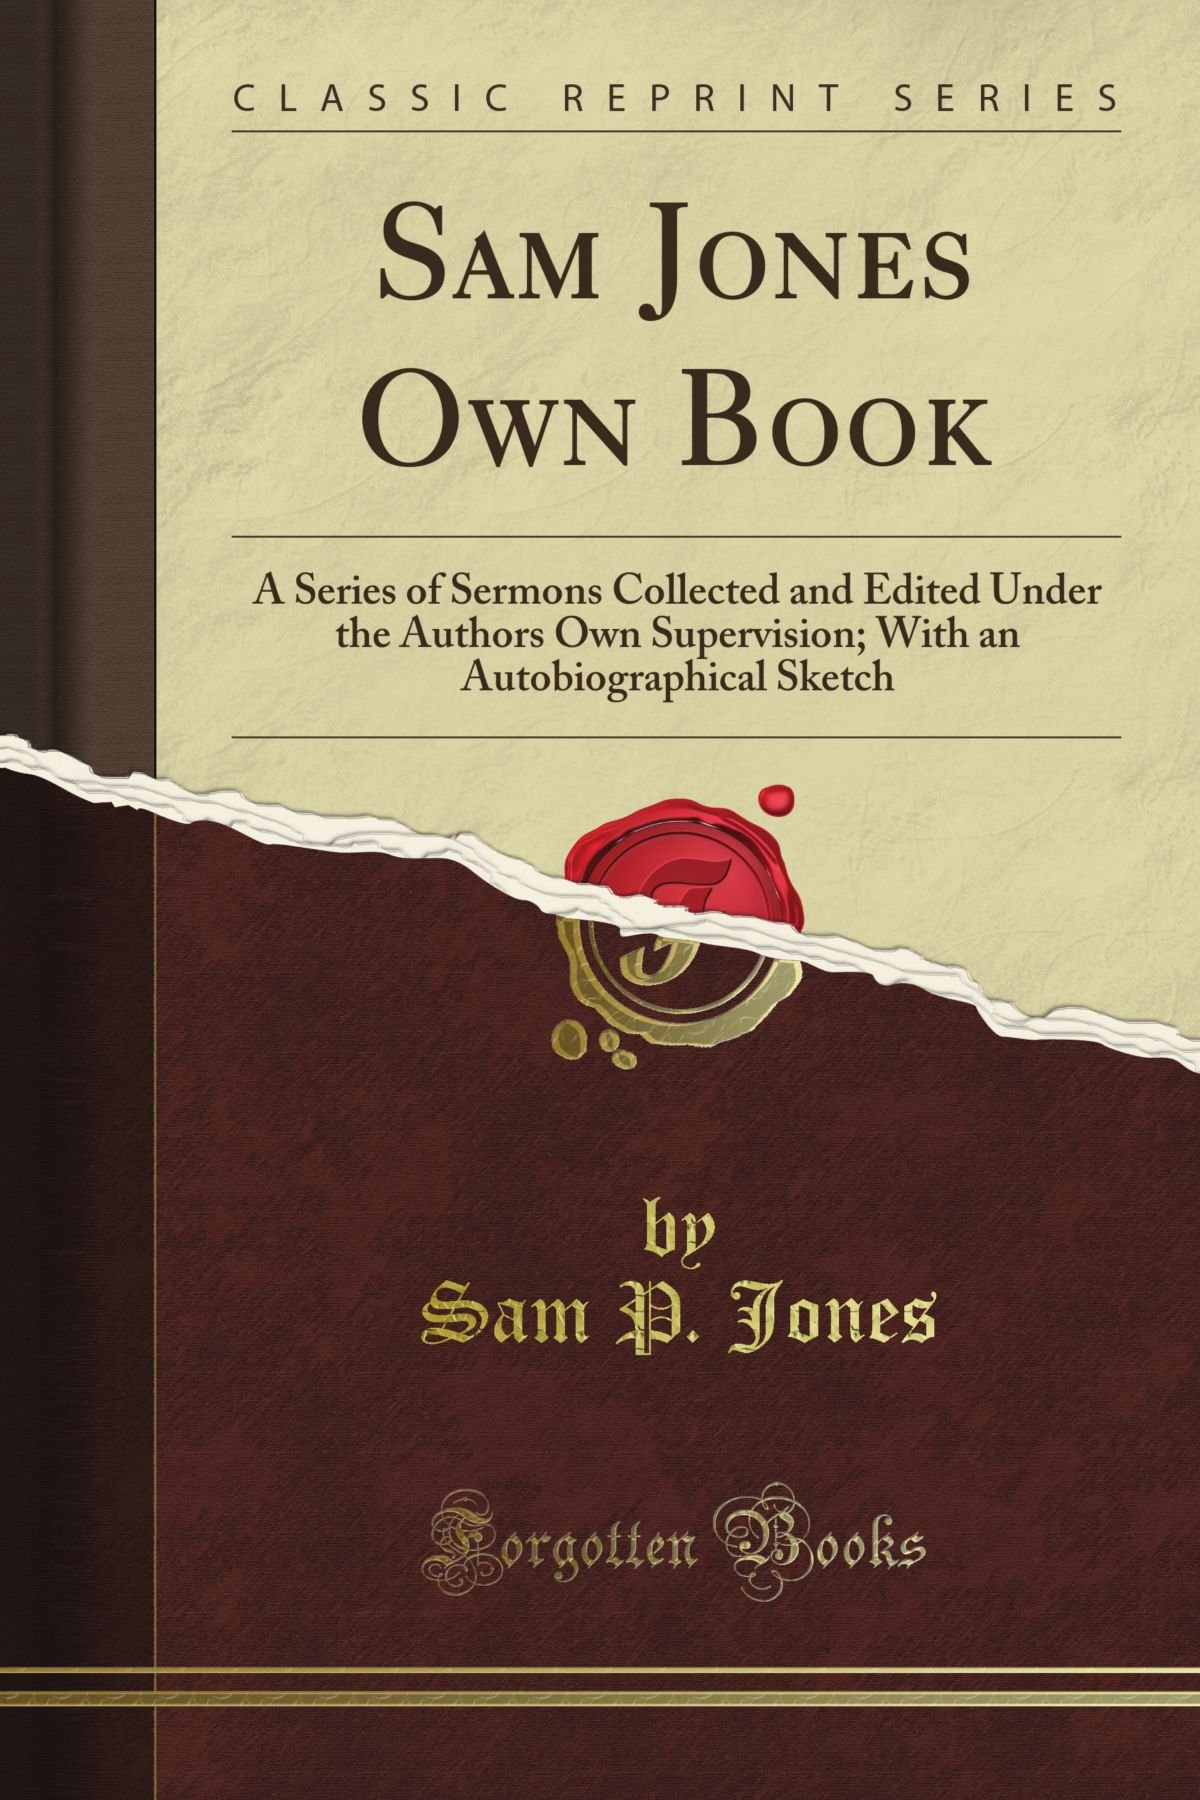 Sam Jones Own Book